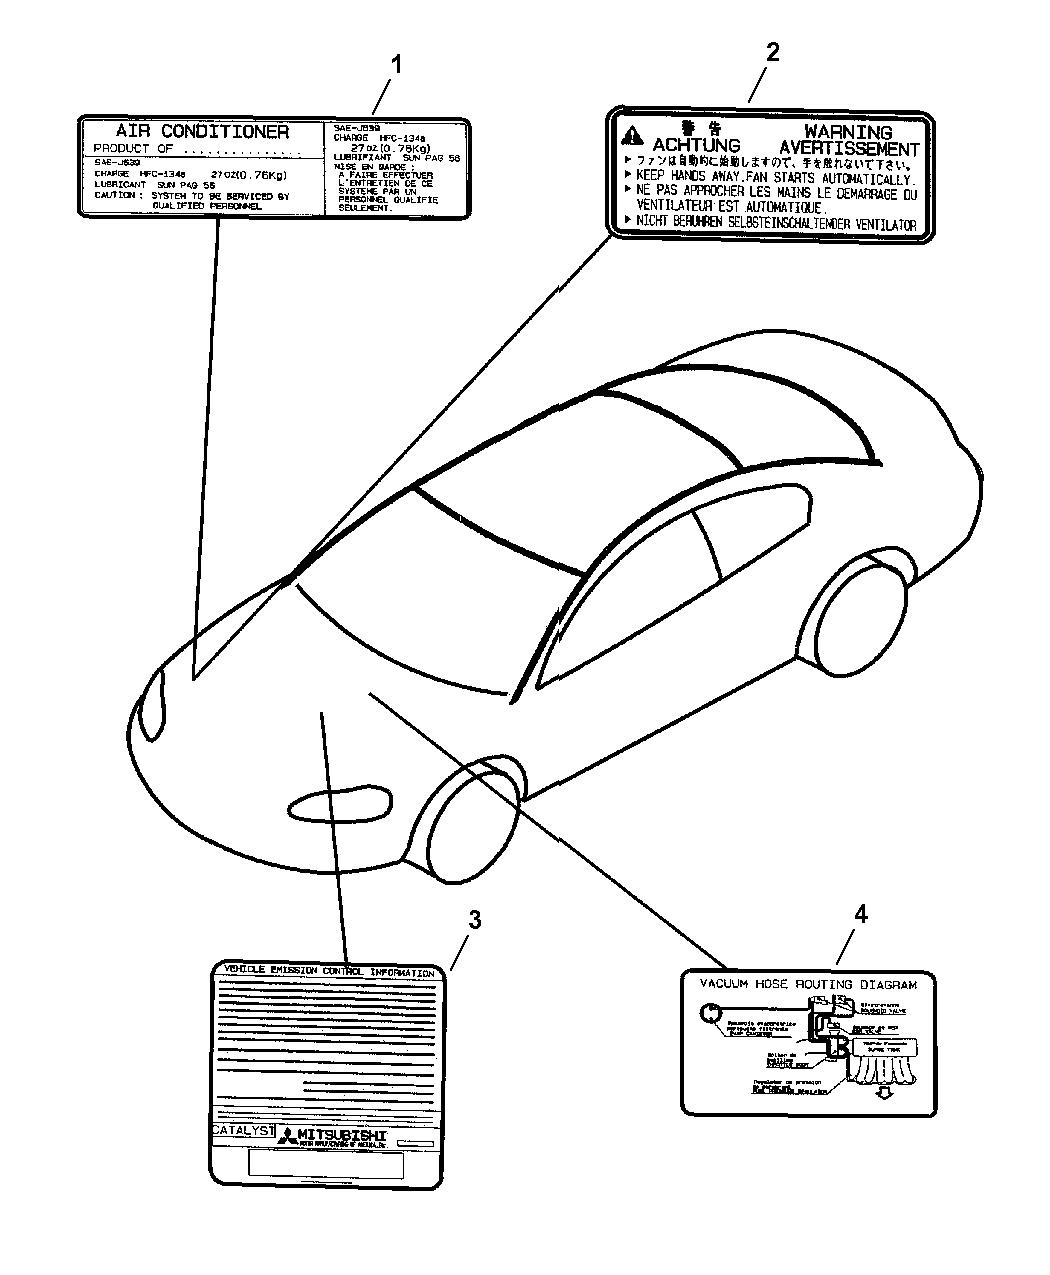 Dodge Stratus Coupe Engine Compartment